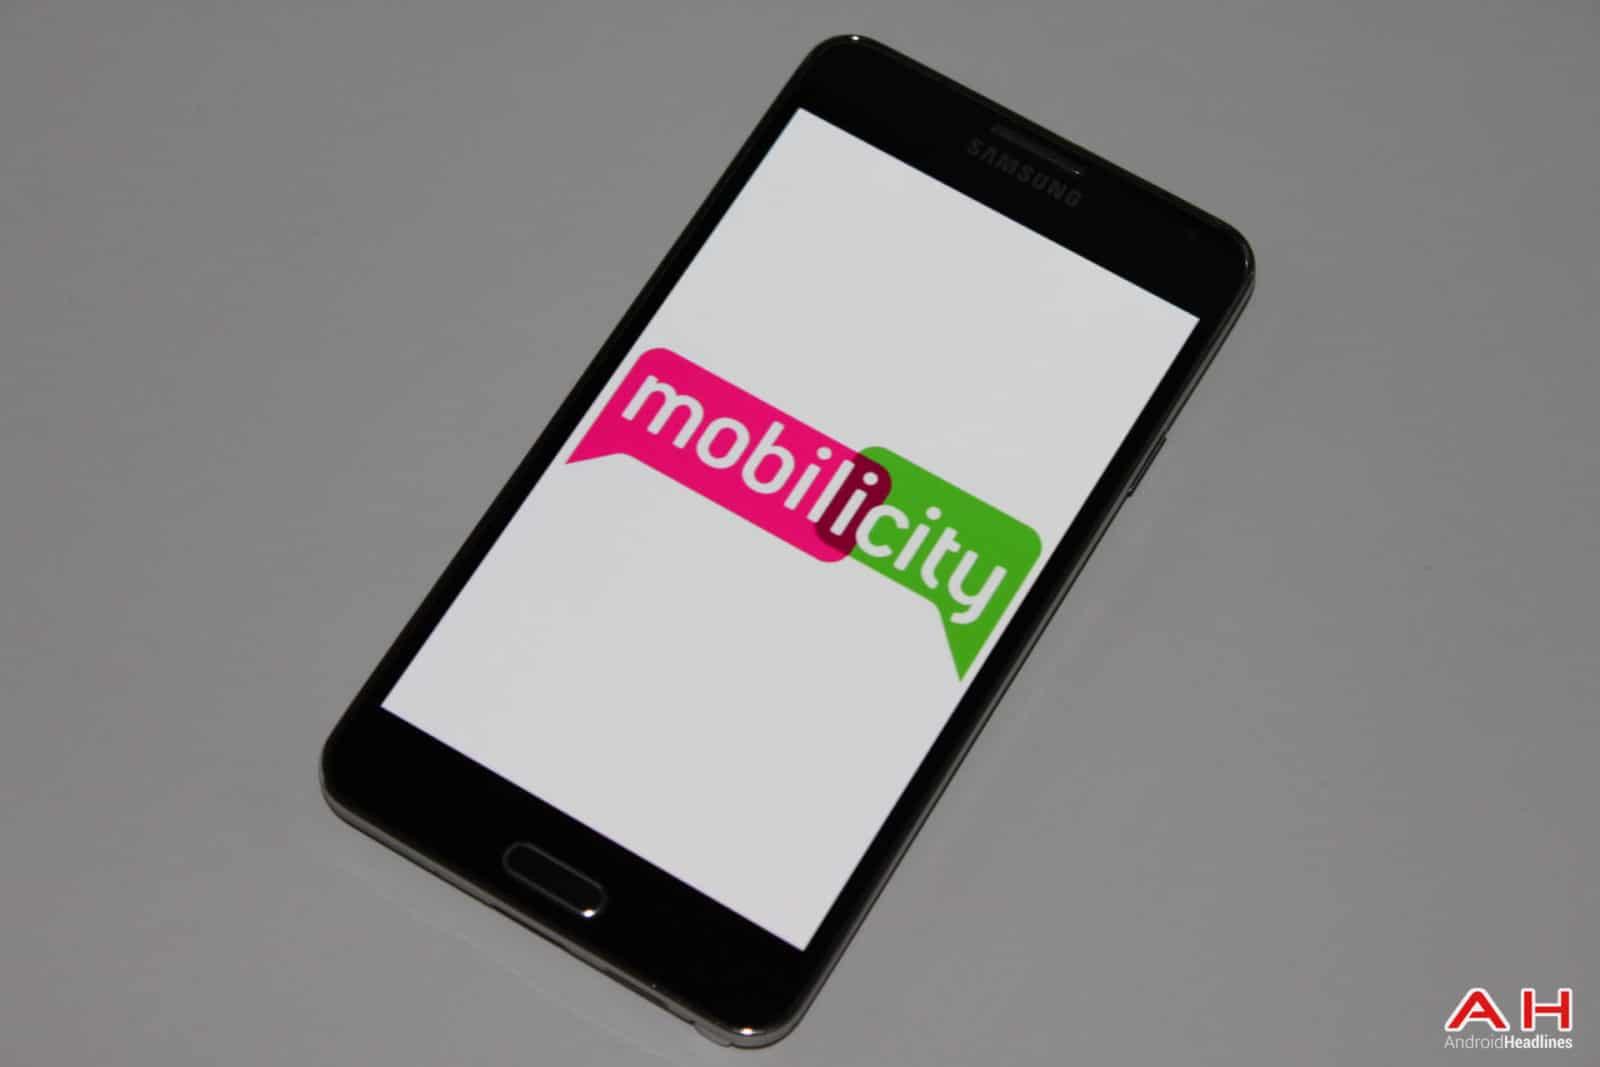 AH Mobilicty Logo 1.0